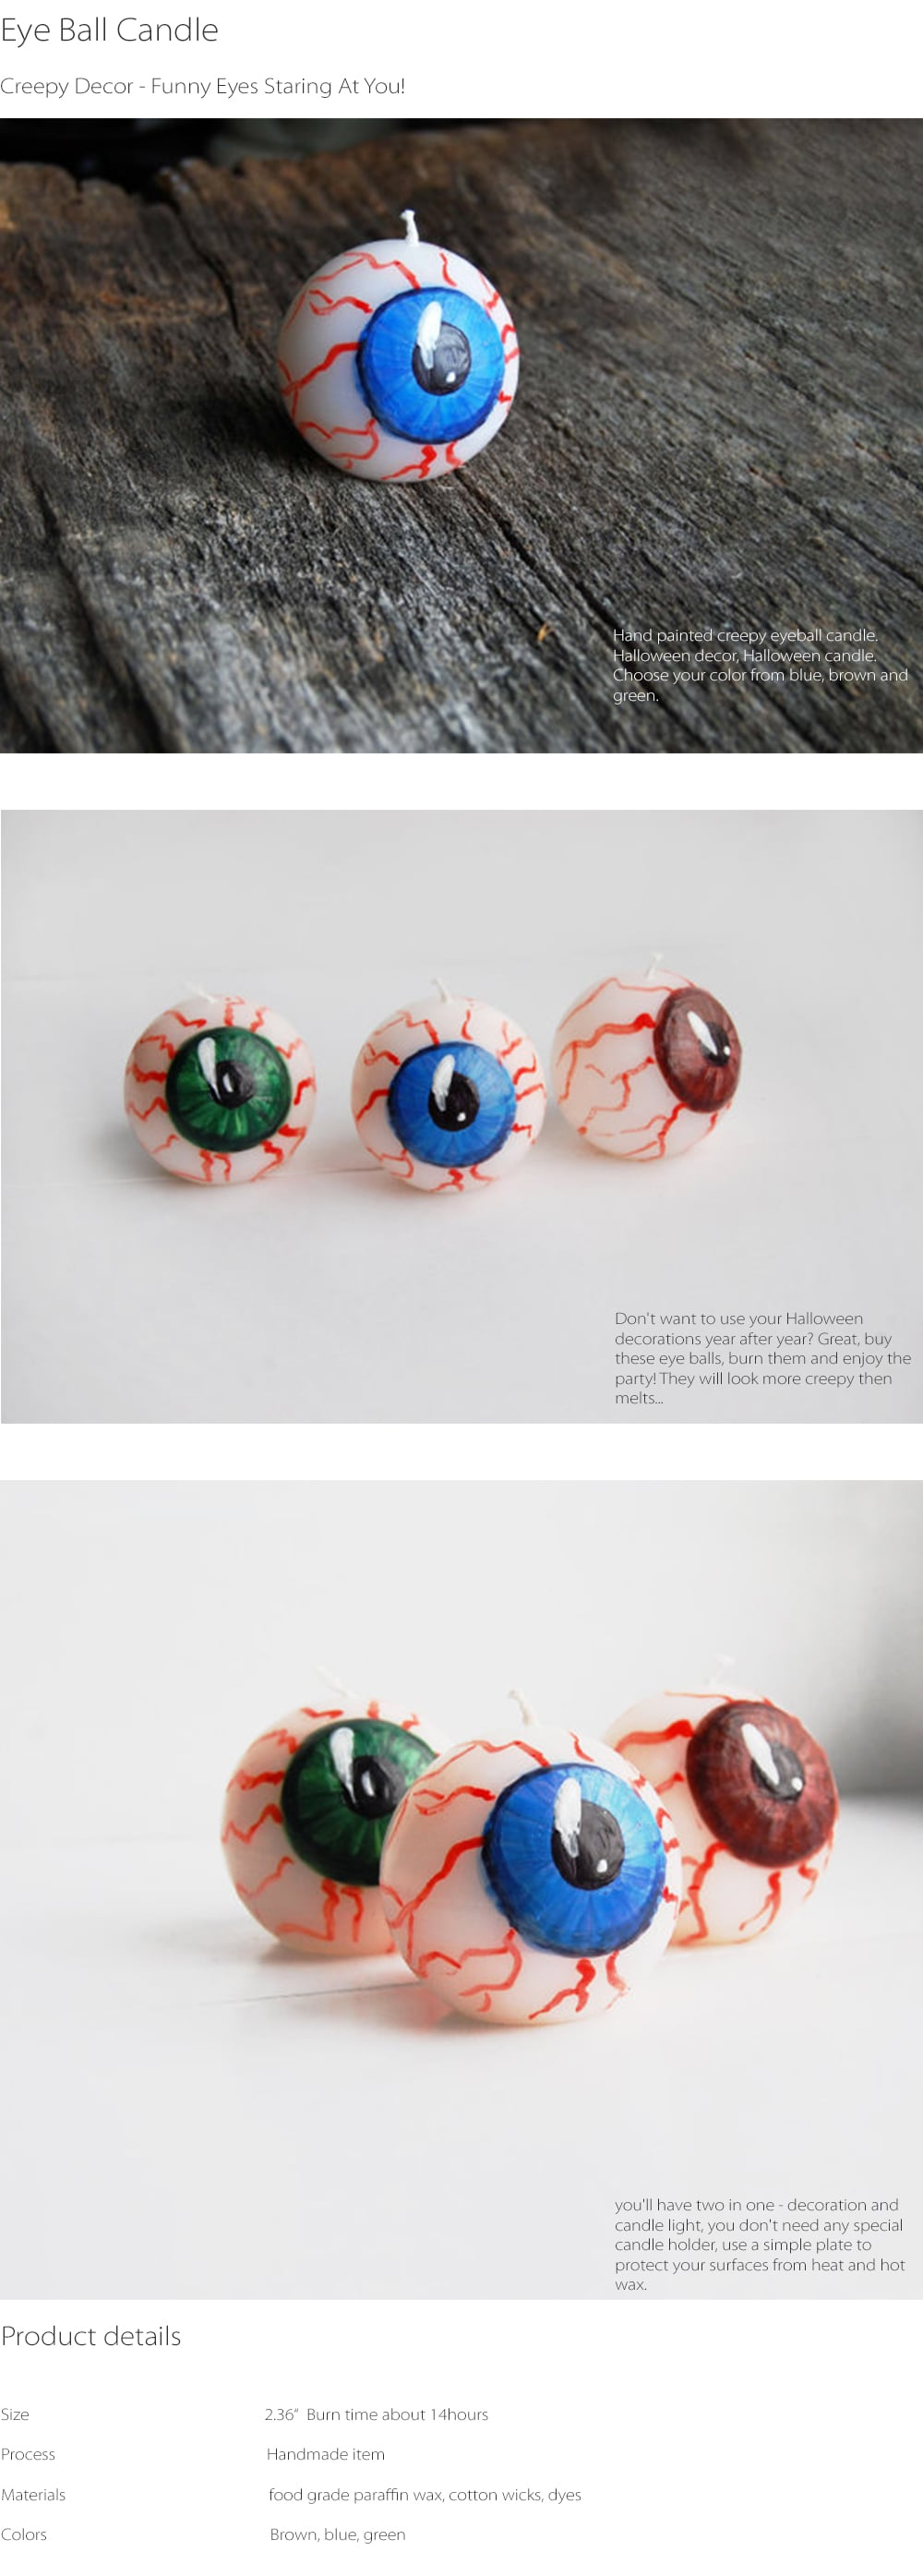 Creepy Eye Ball Candle Funny Eyes Staring At You